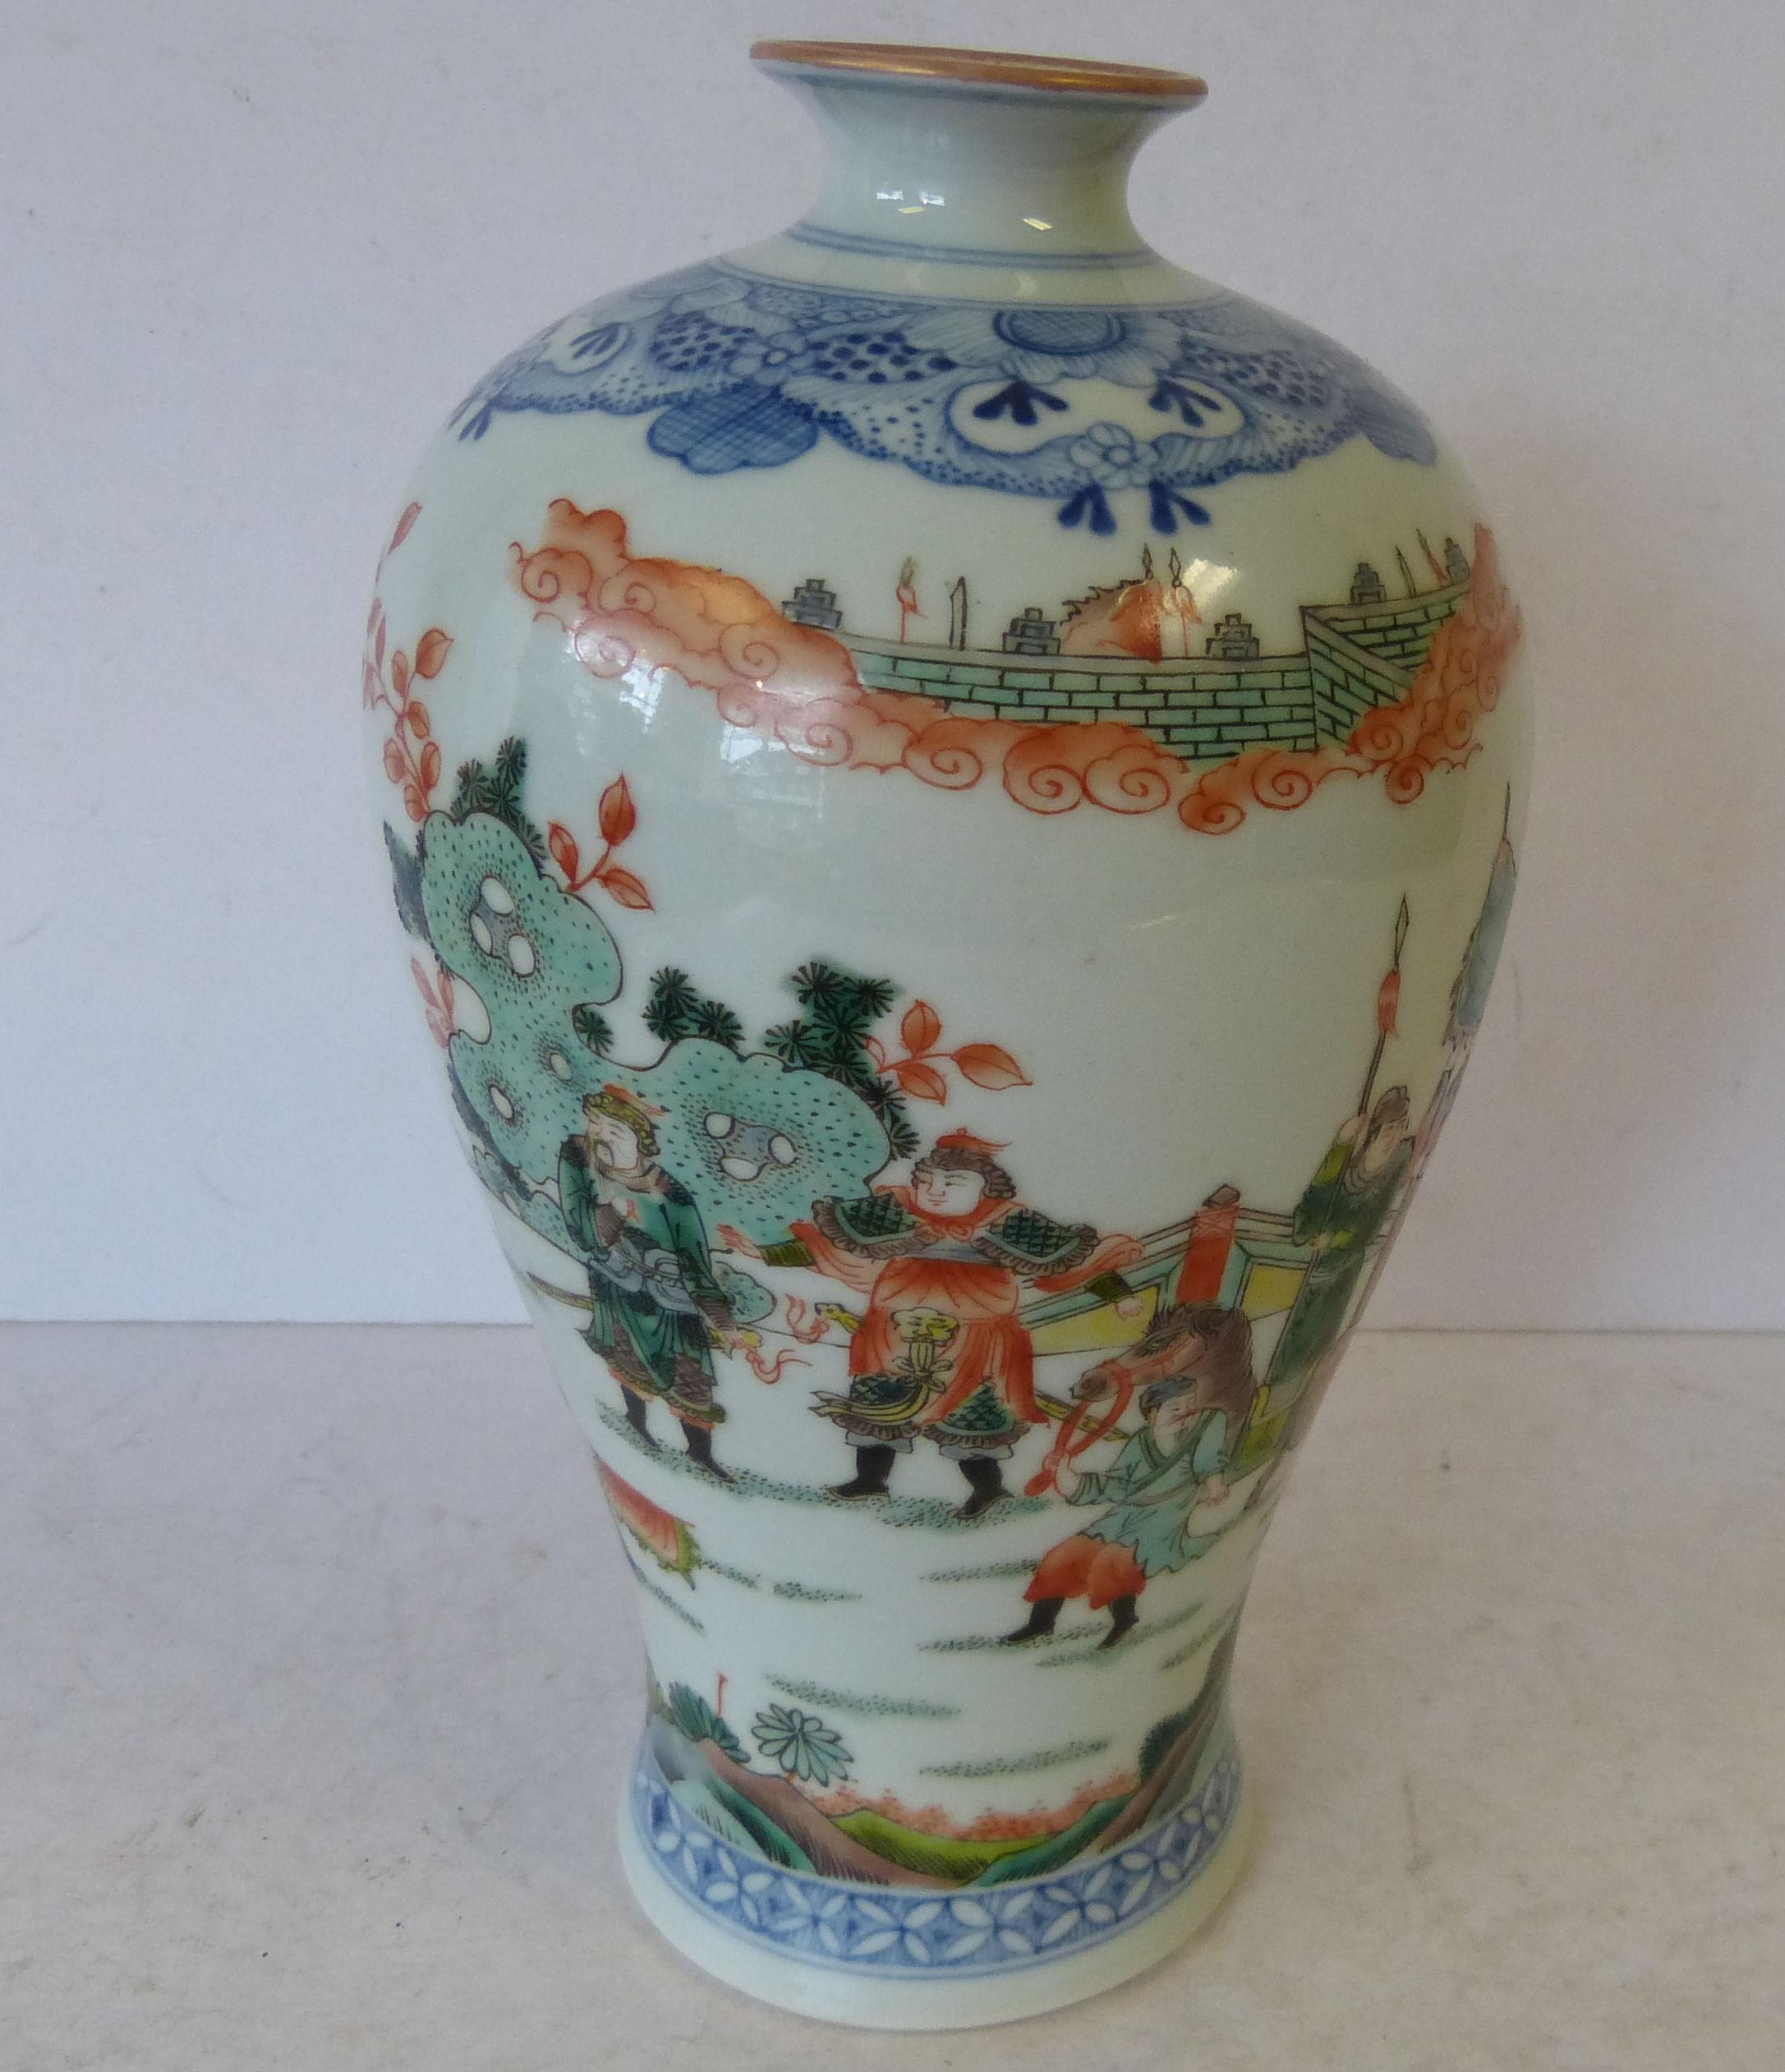 A Chinese Bulbous Thin Neck Vase having multicoloured warrior decoration